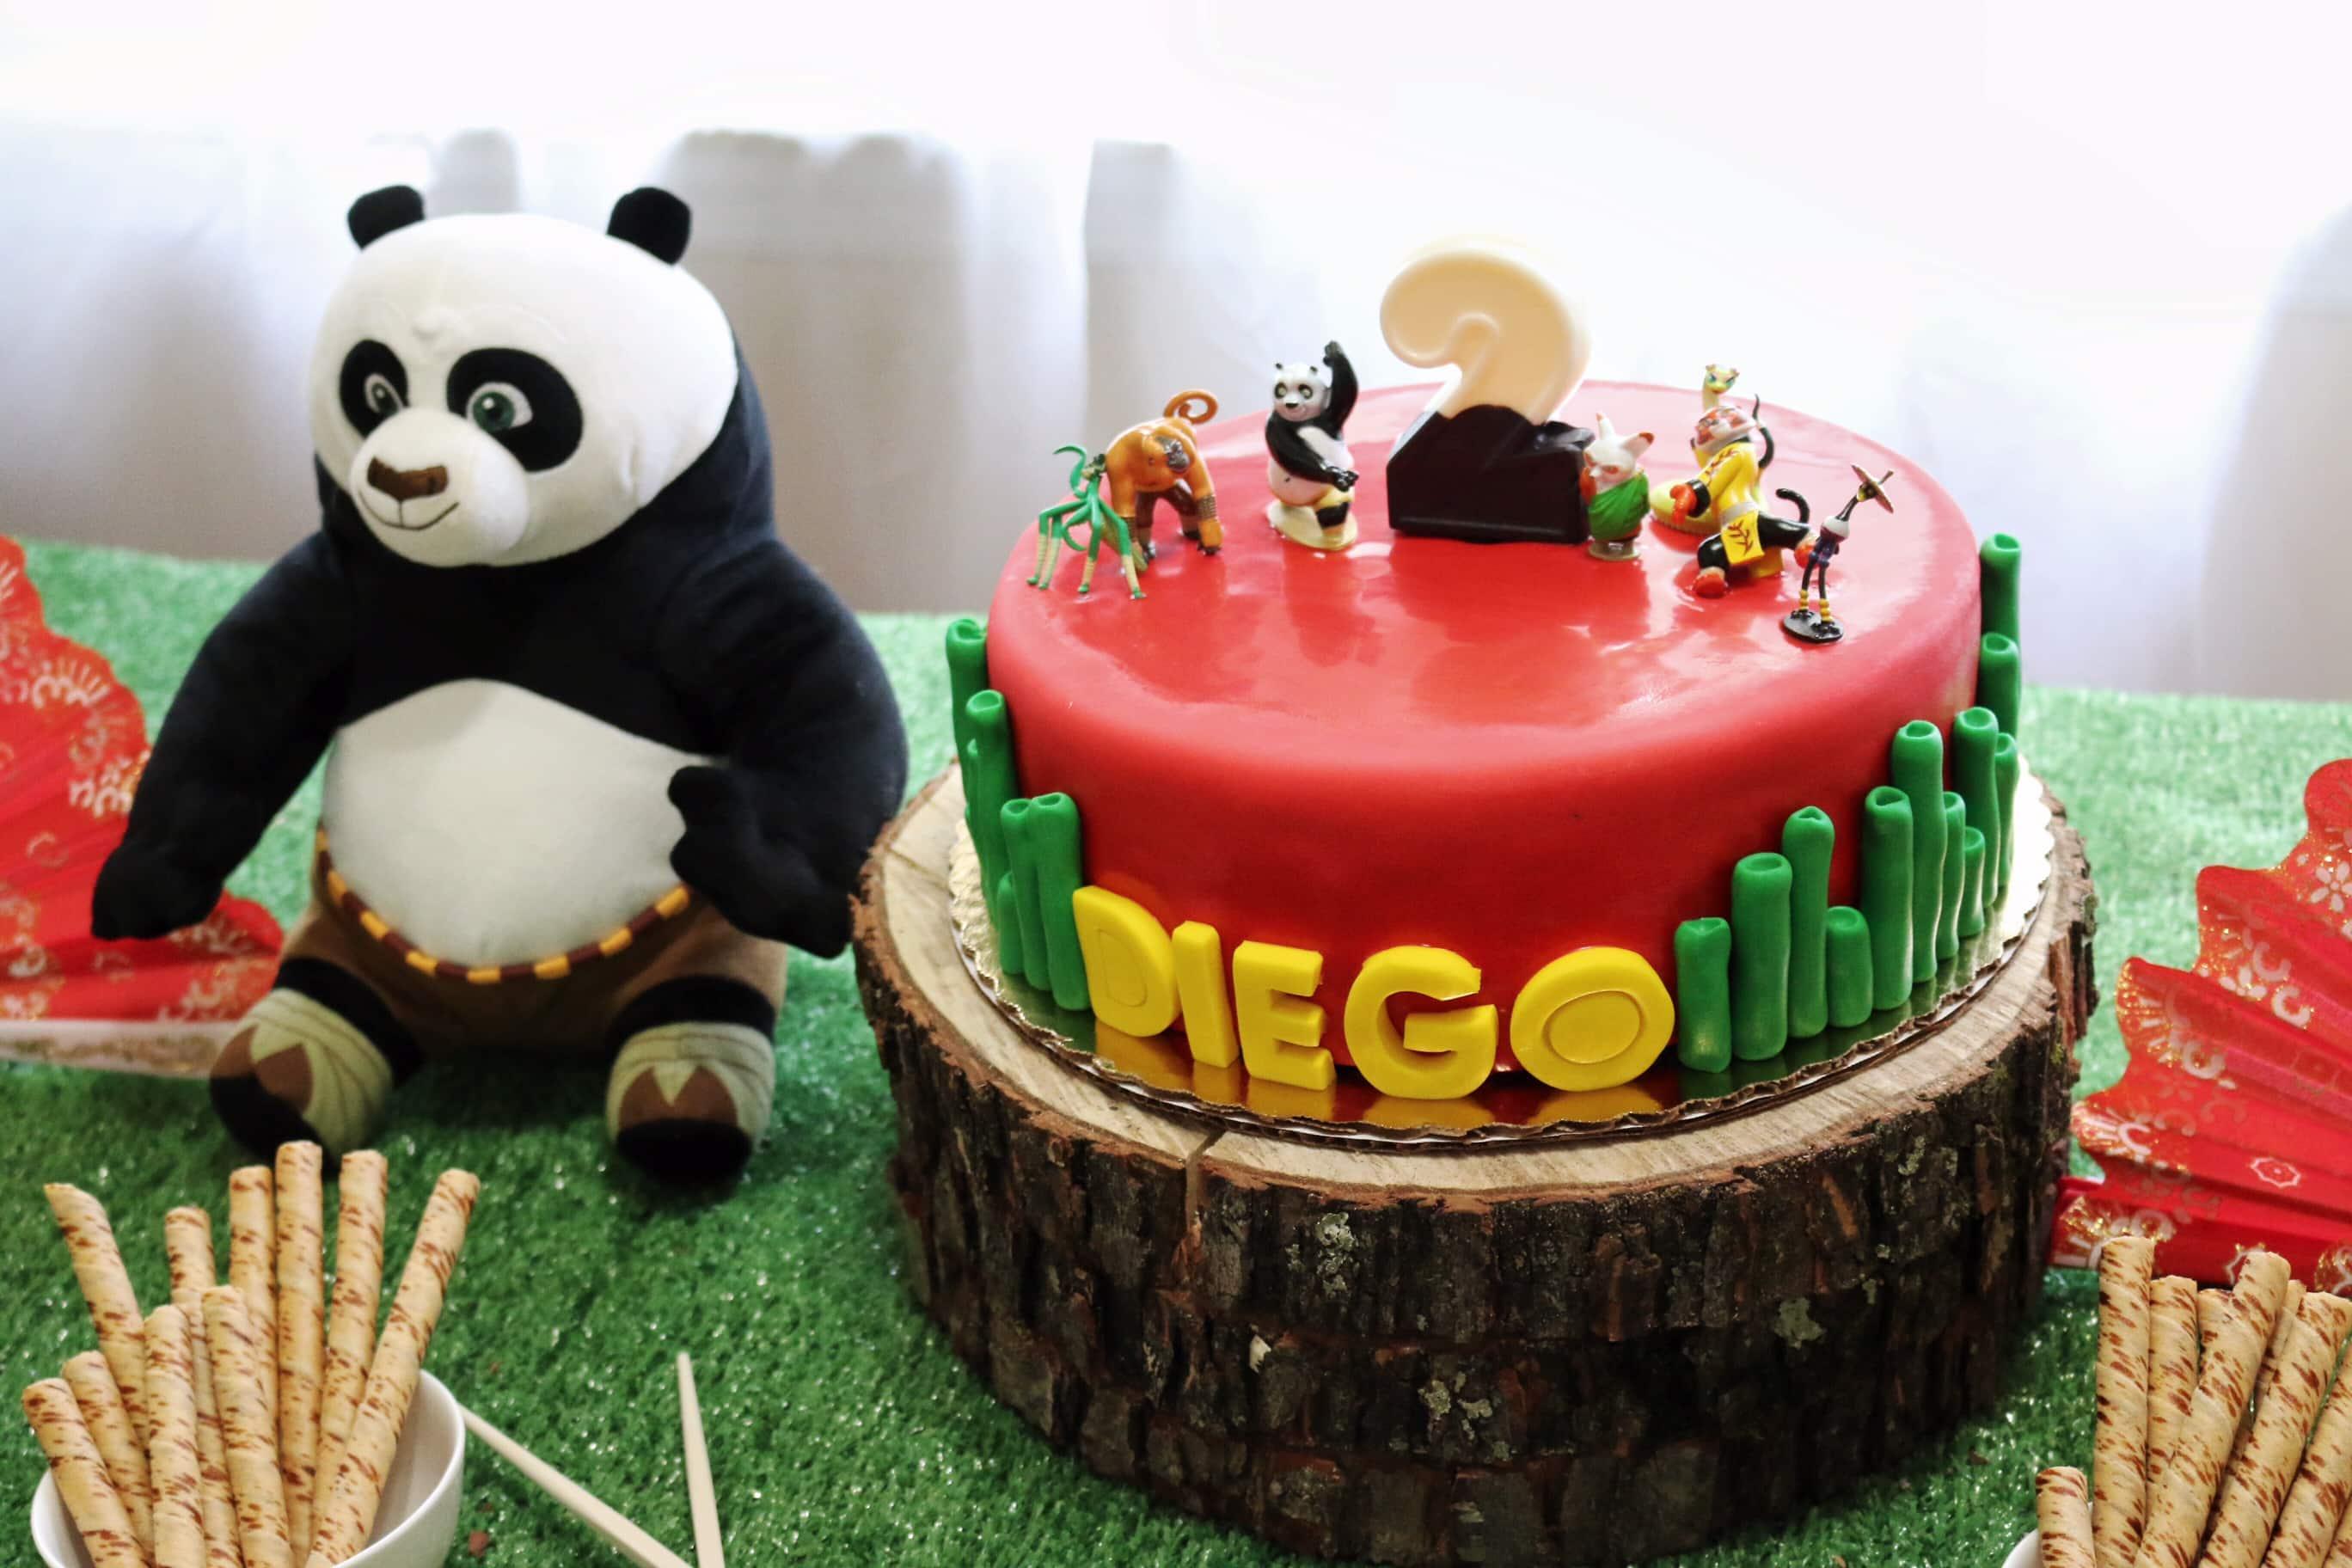 Kung-fu-panda-birthday-cake